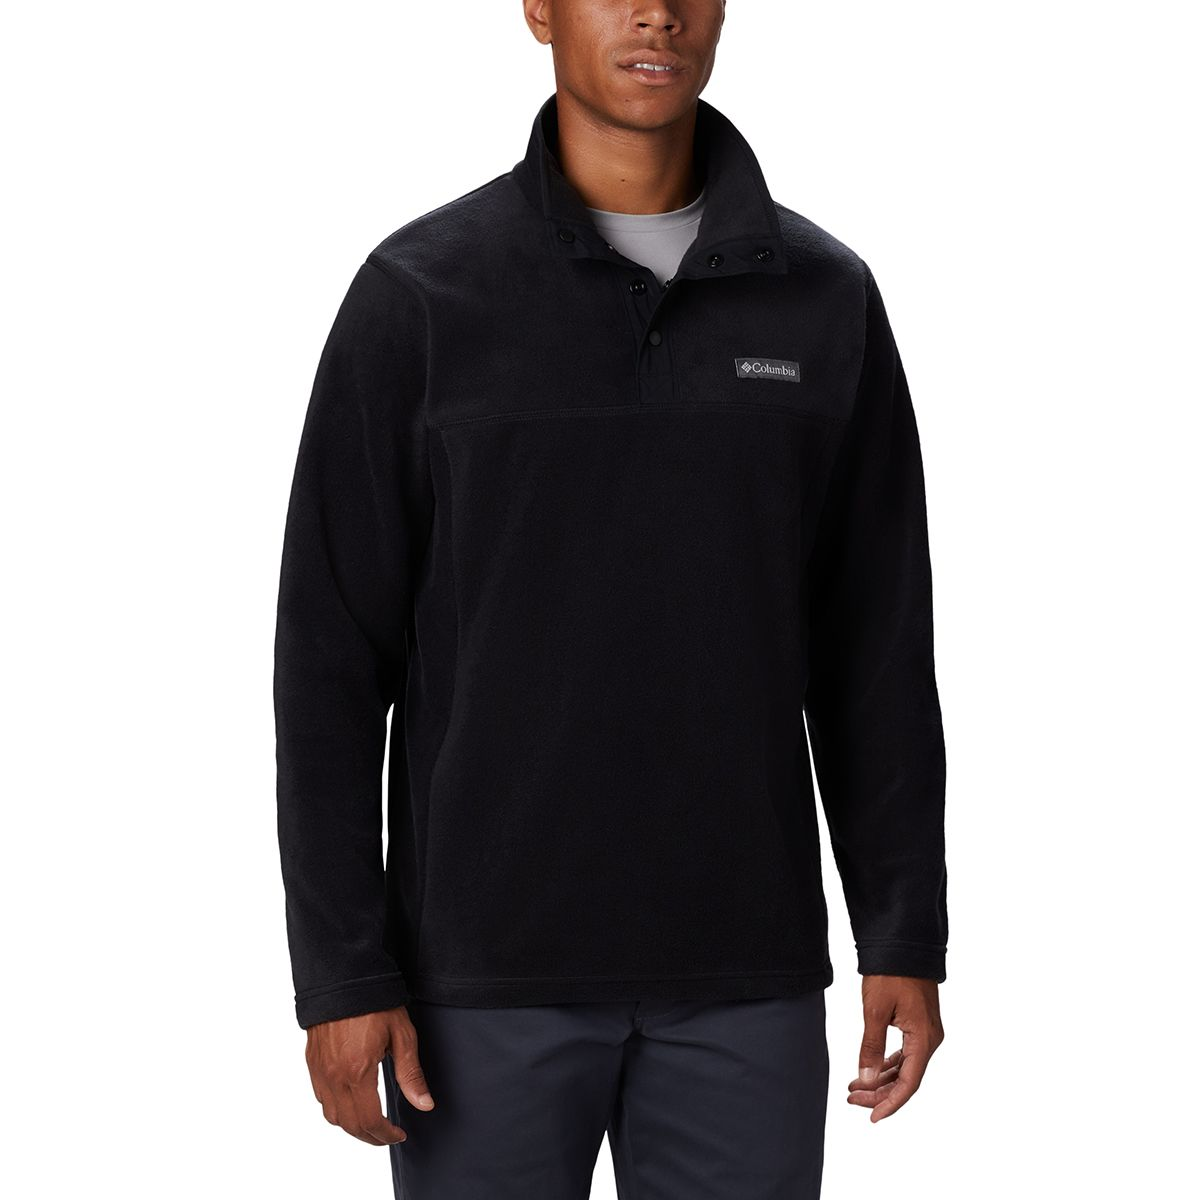 Steens Mountain 1/2-Snap Fleece Jacket - Men